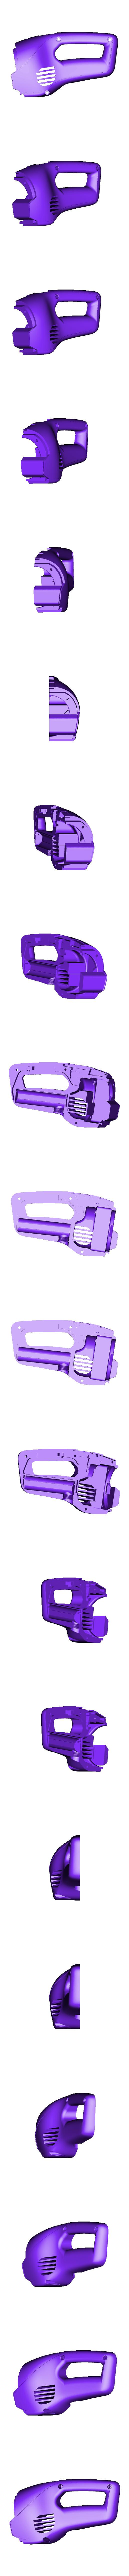 BODY_L.stl Download STL file Fully working toy vacuum cleaner  • 3D printable design, kozakm